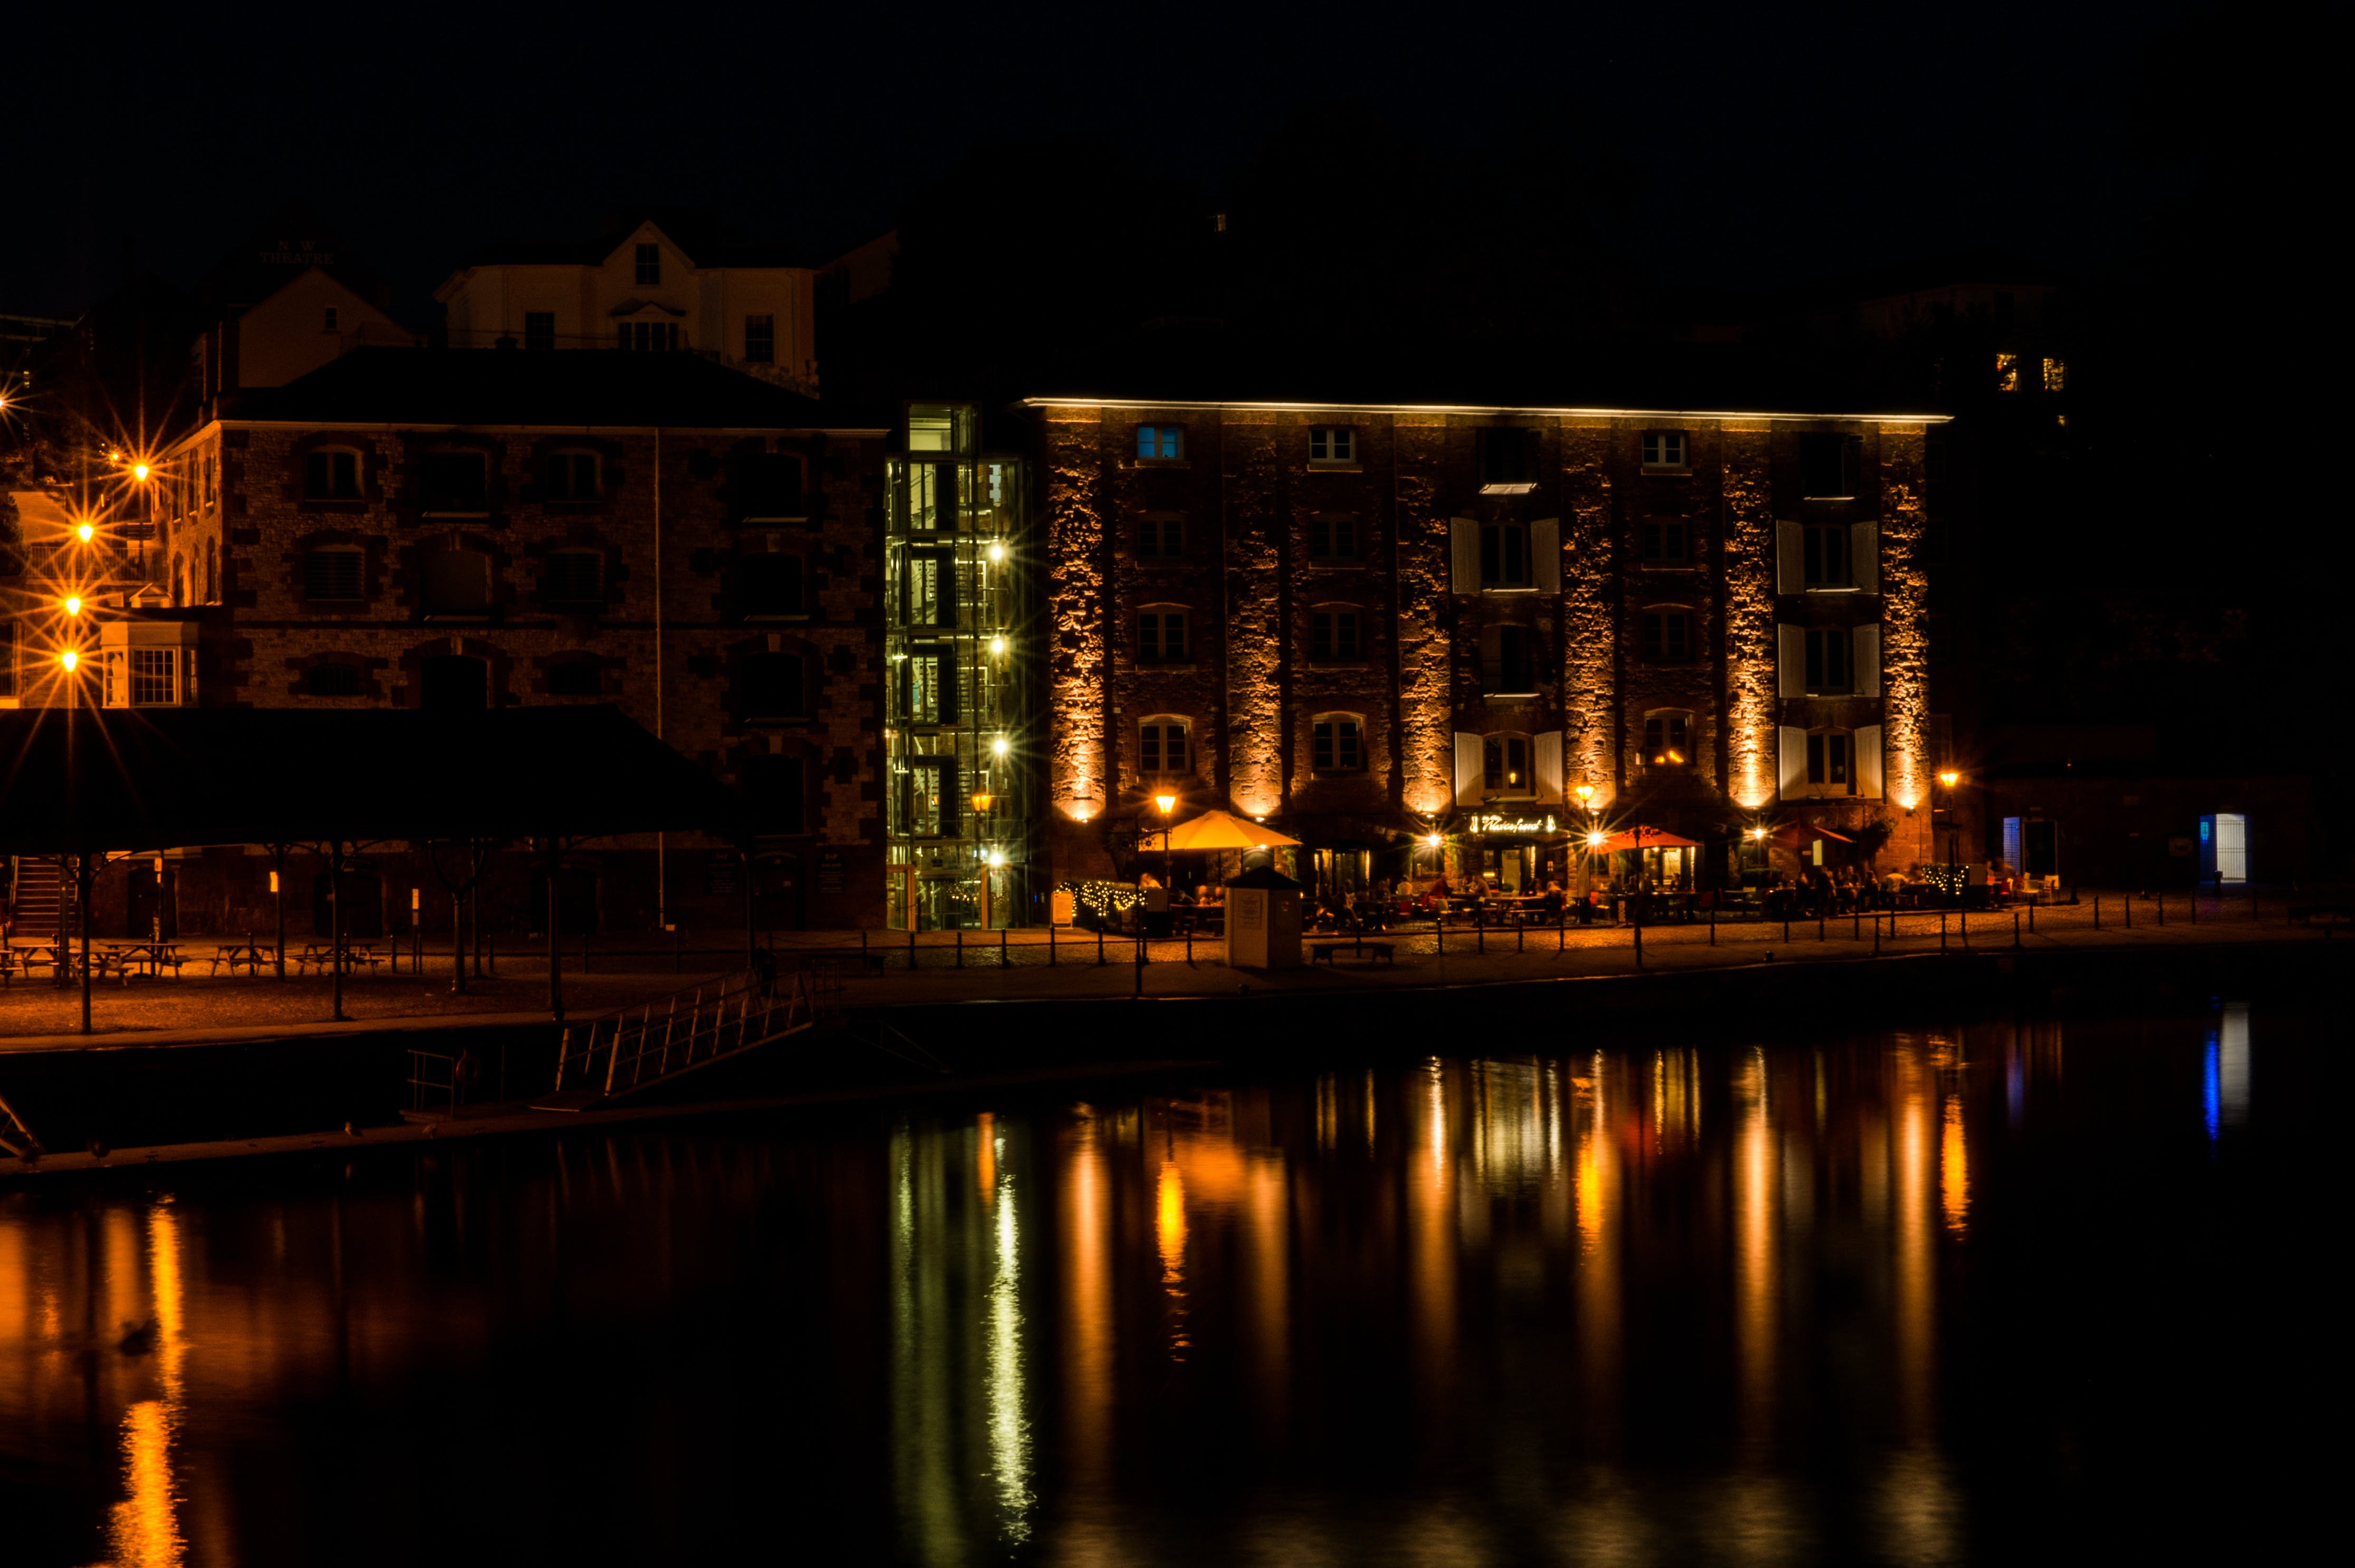 lights, night, reflections